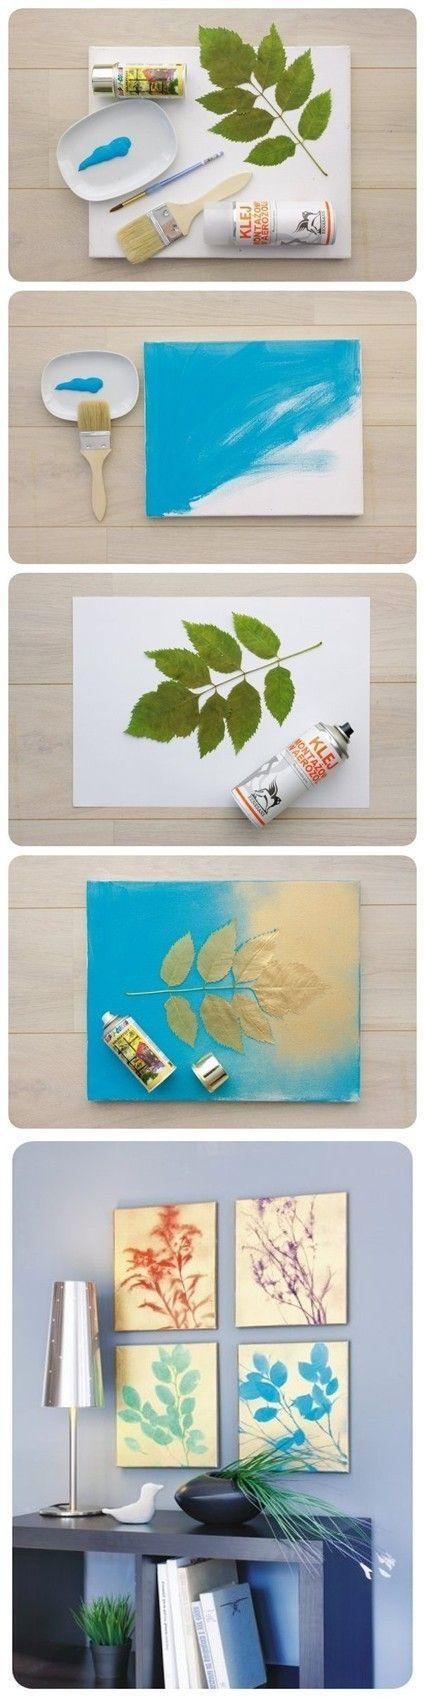 Spray paint leaves